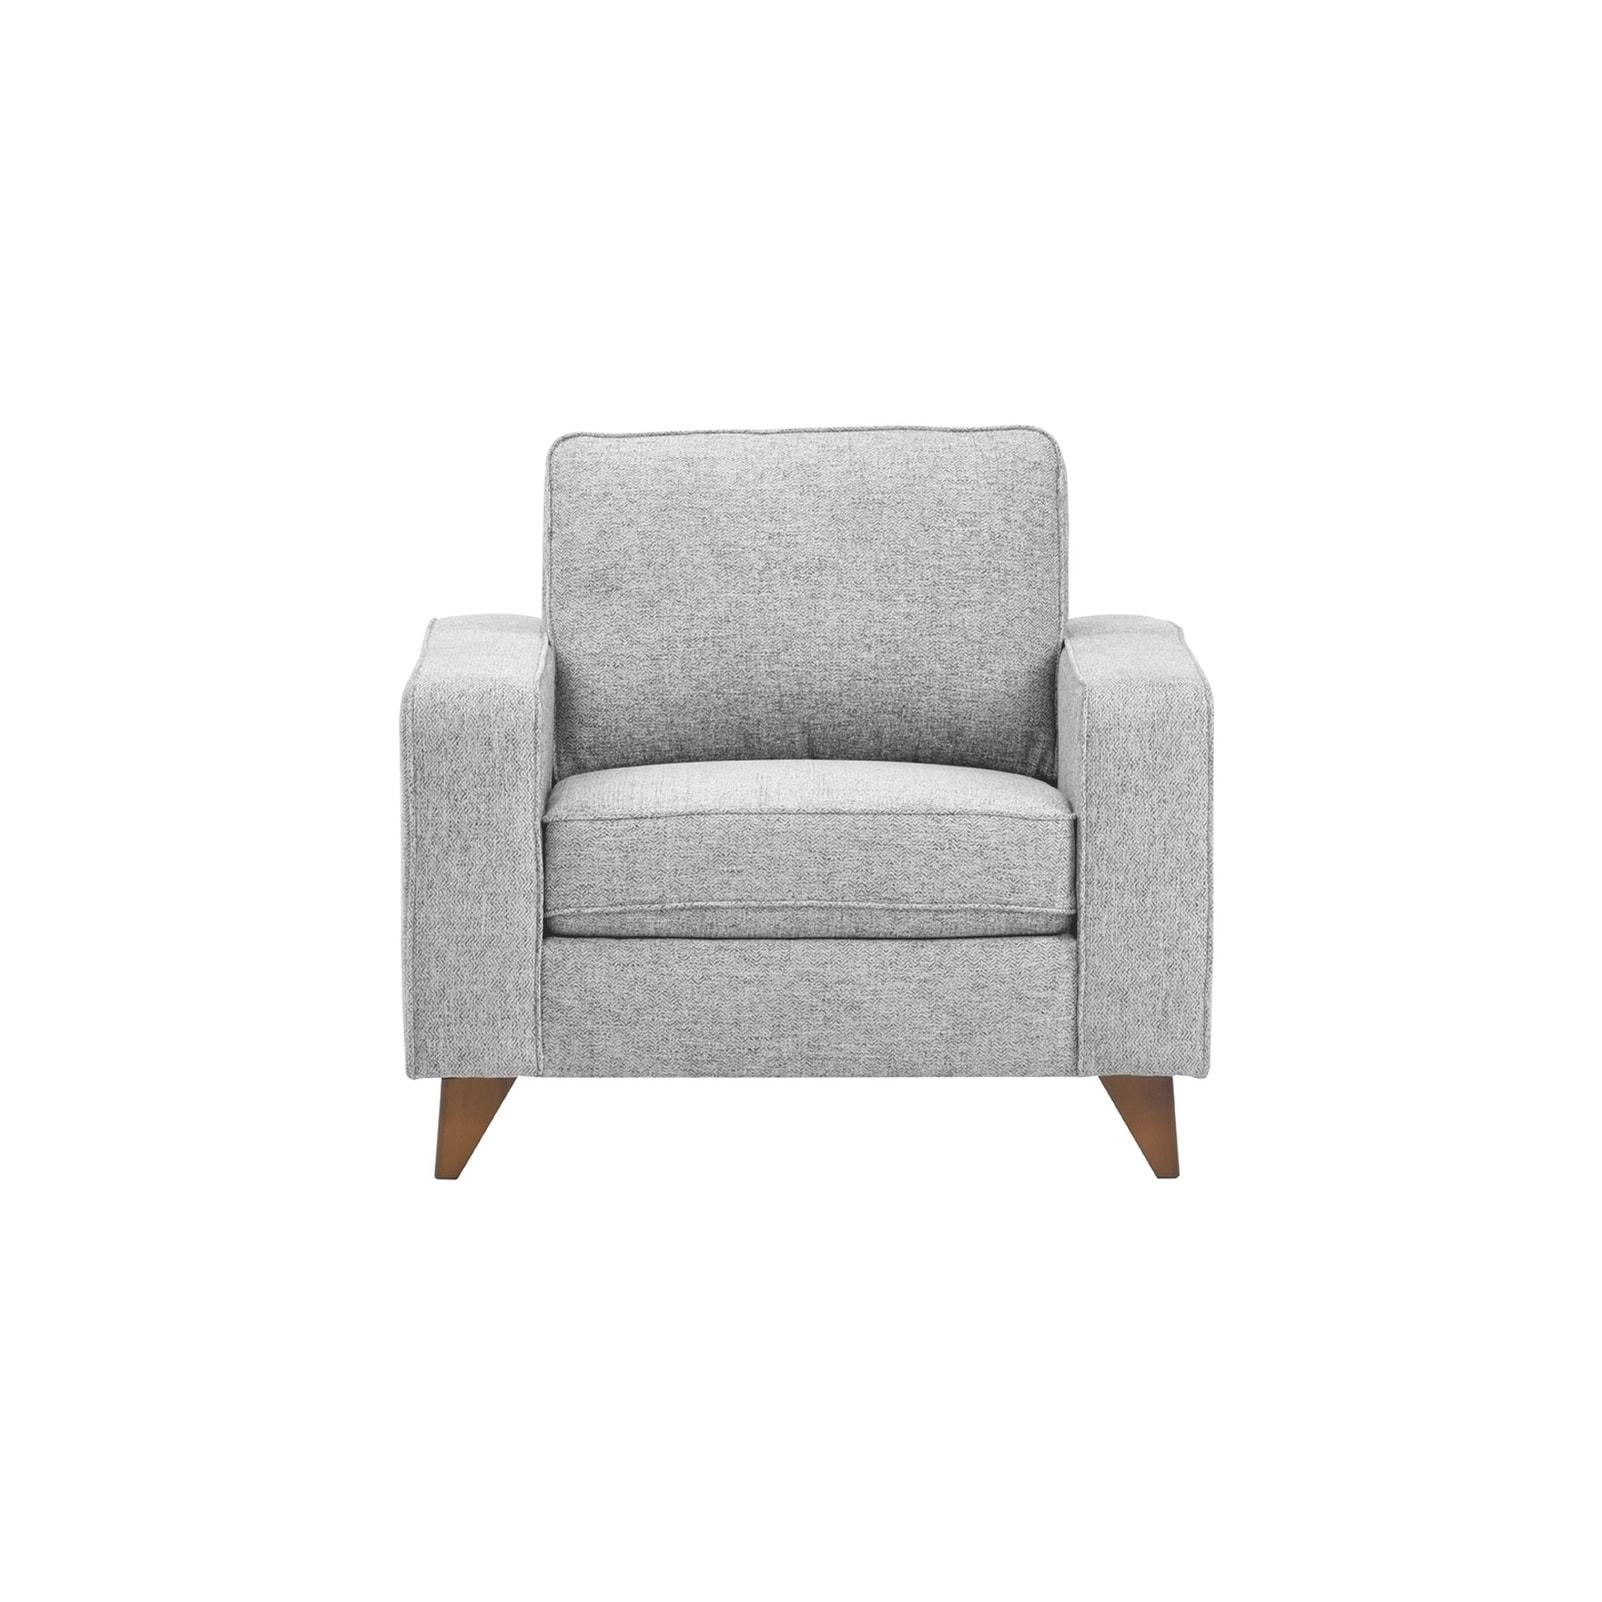 Shop Luca Home Modern Grayson Sofa bed, Loveseat, & Chair Set - Free ...